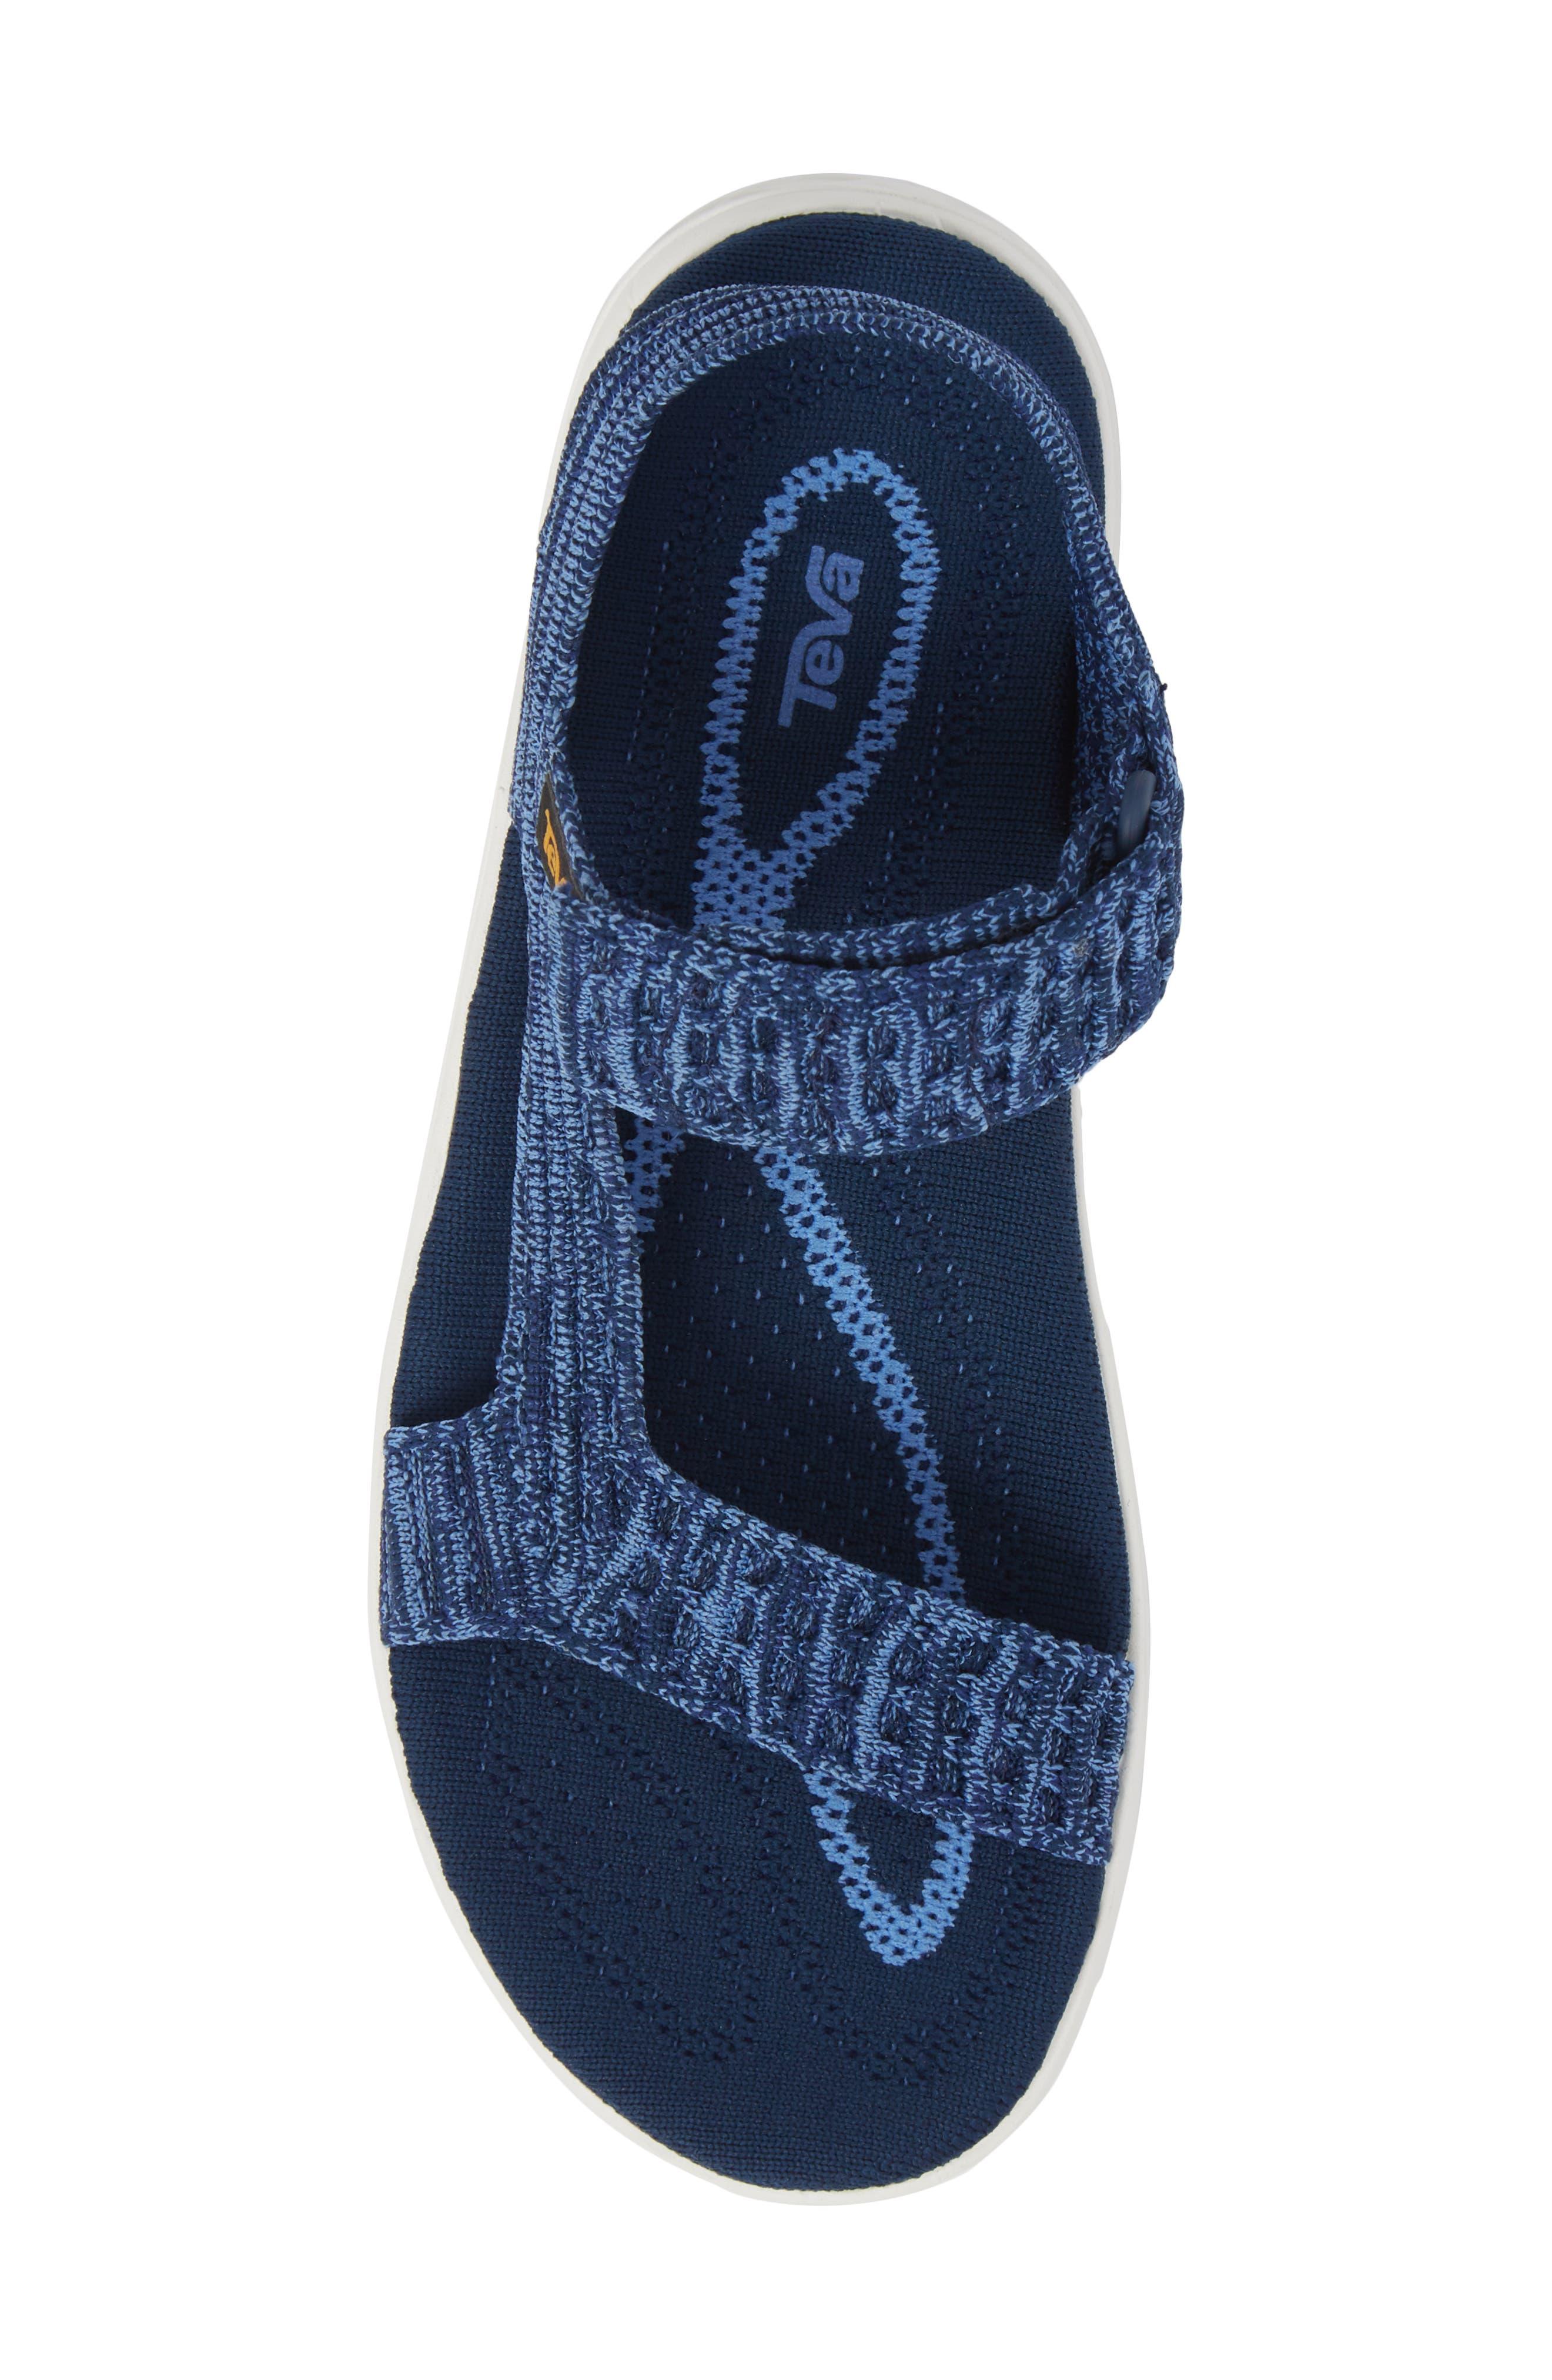 Terra Float 2 Knit Universal Sandal,                             Alternate thumbnail 20, color,